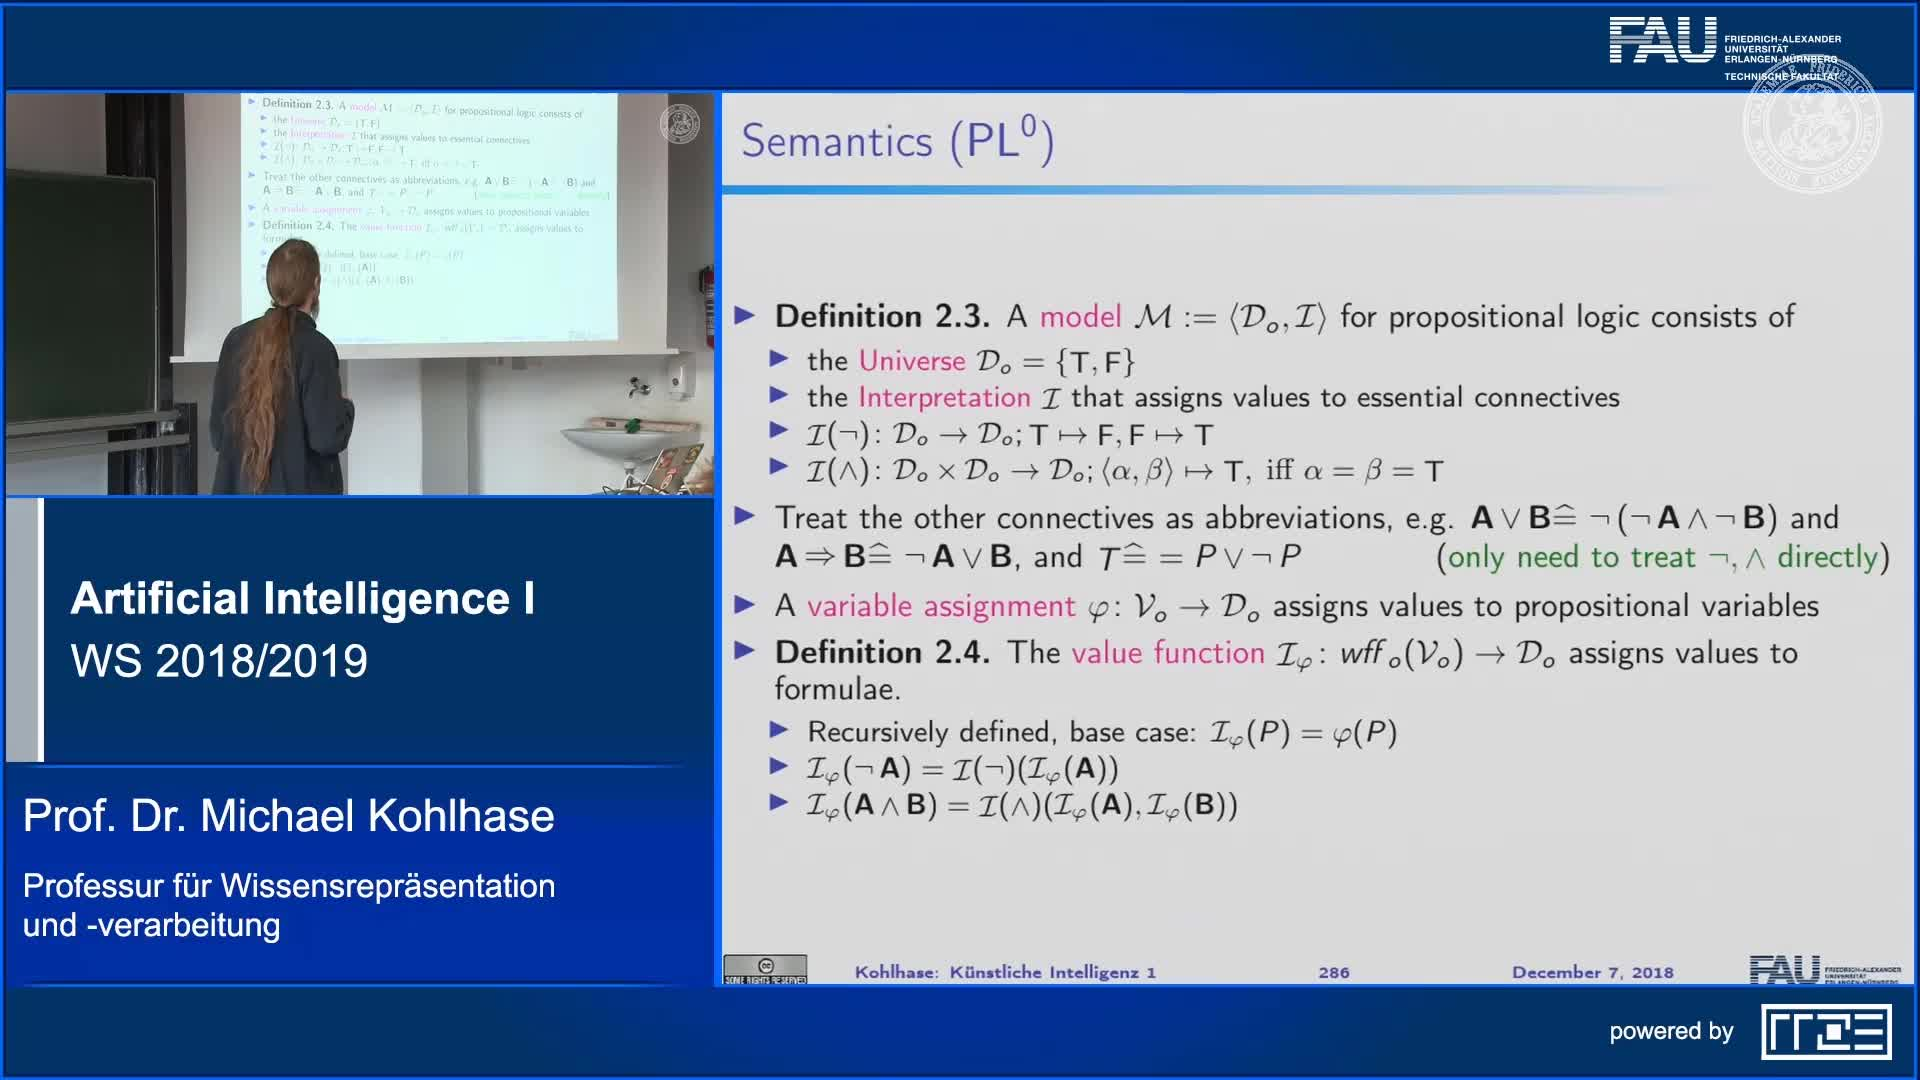 Propositional Logic (Syntax, Semantics) (Part 2) preview image